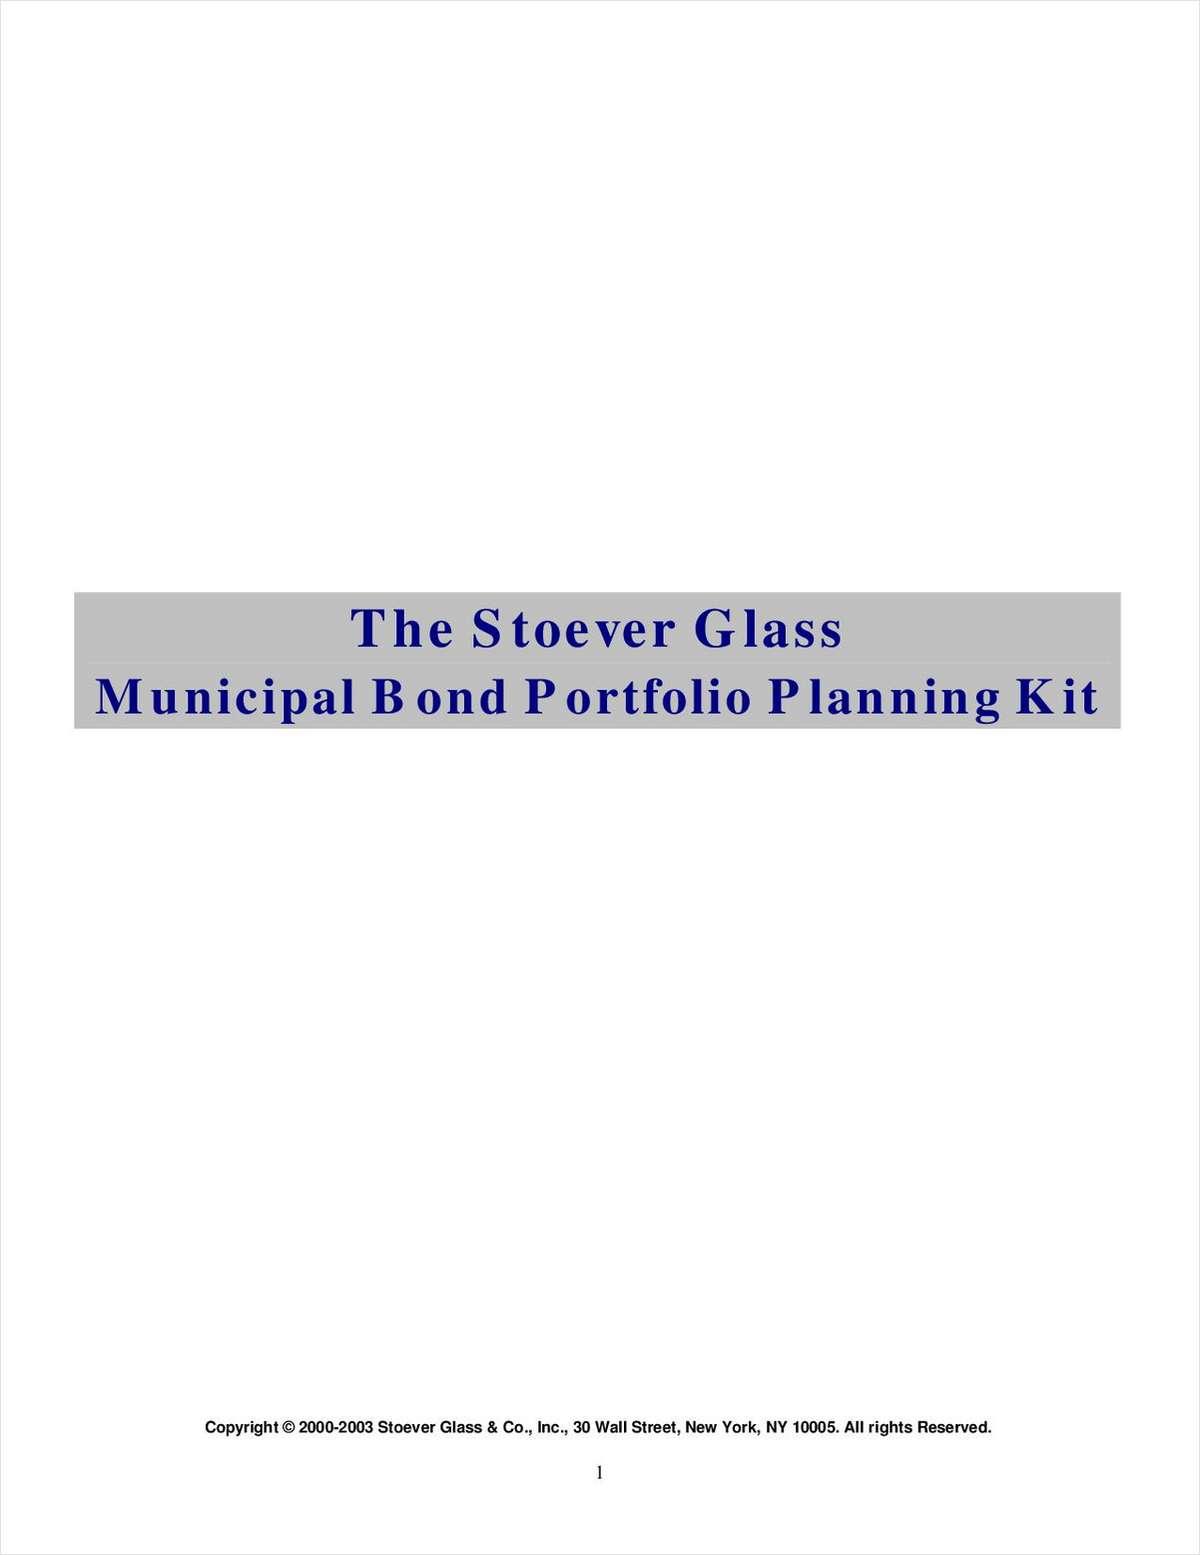 The Stoever Glass Municipal Bond Portfolio Planning Kit